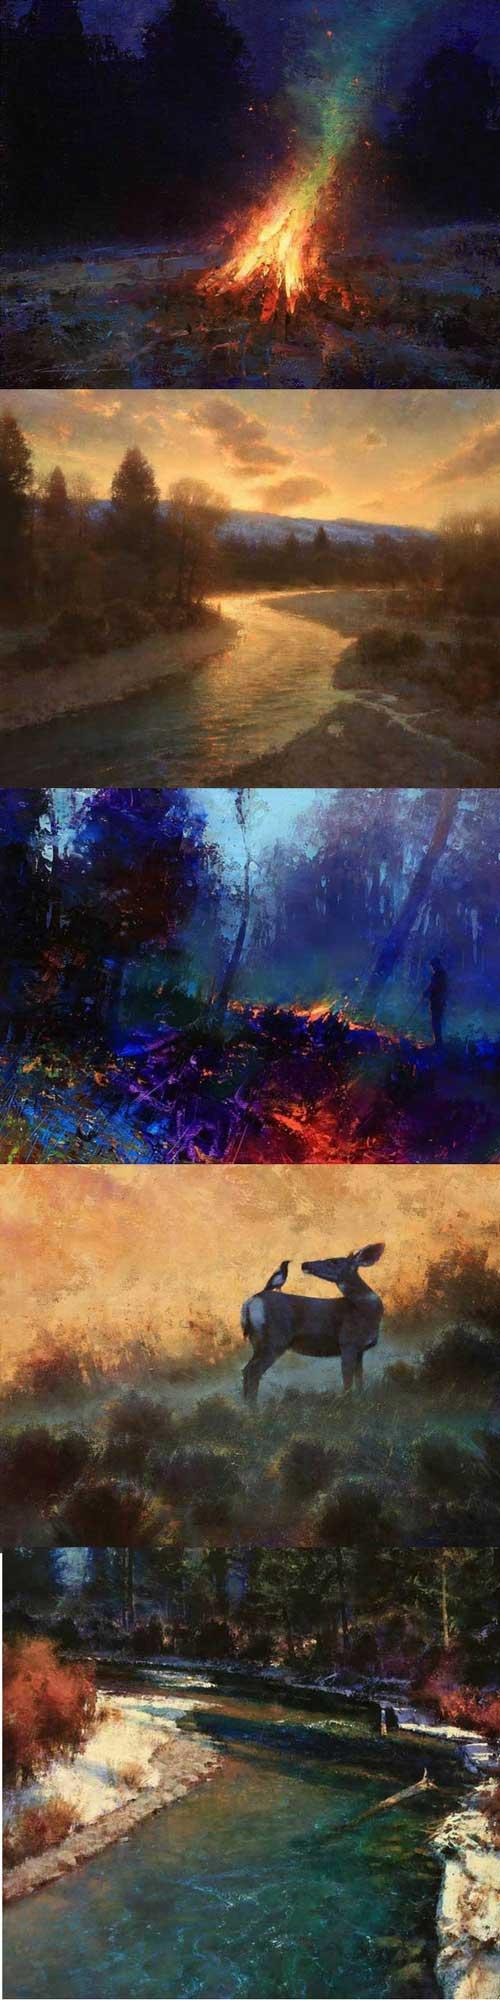 Artist Spotlight - Brent Cotton   Landscape Painting   Art Ideas   Landscape Ideas   Painting Ideas   Art Inspiration